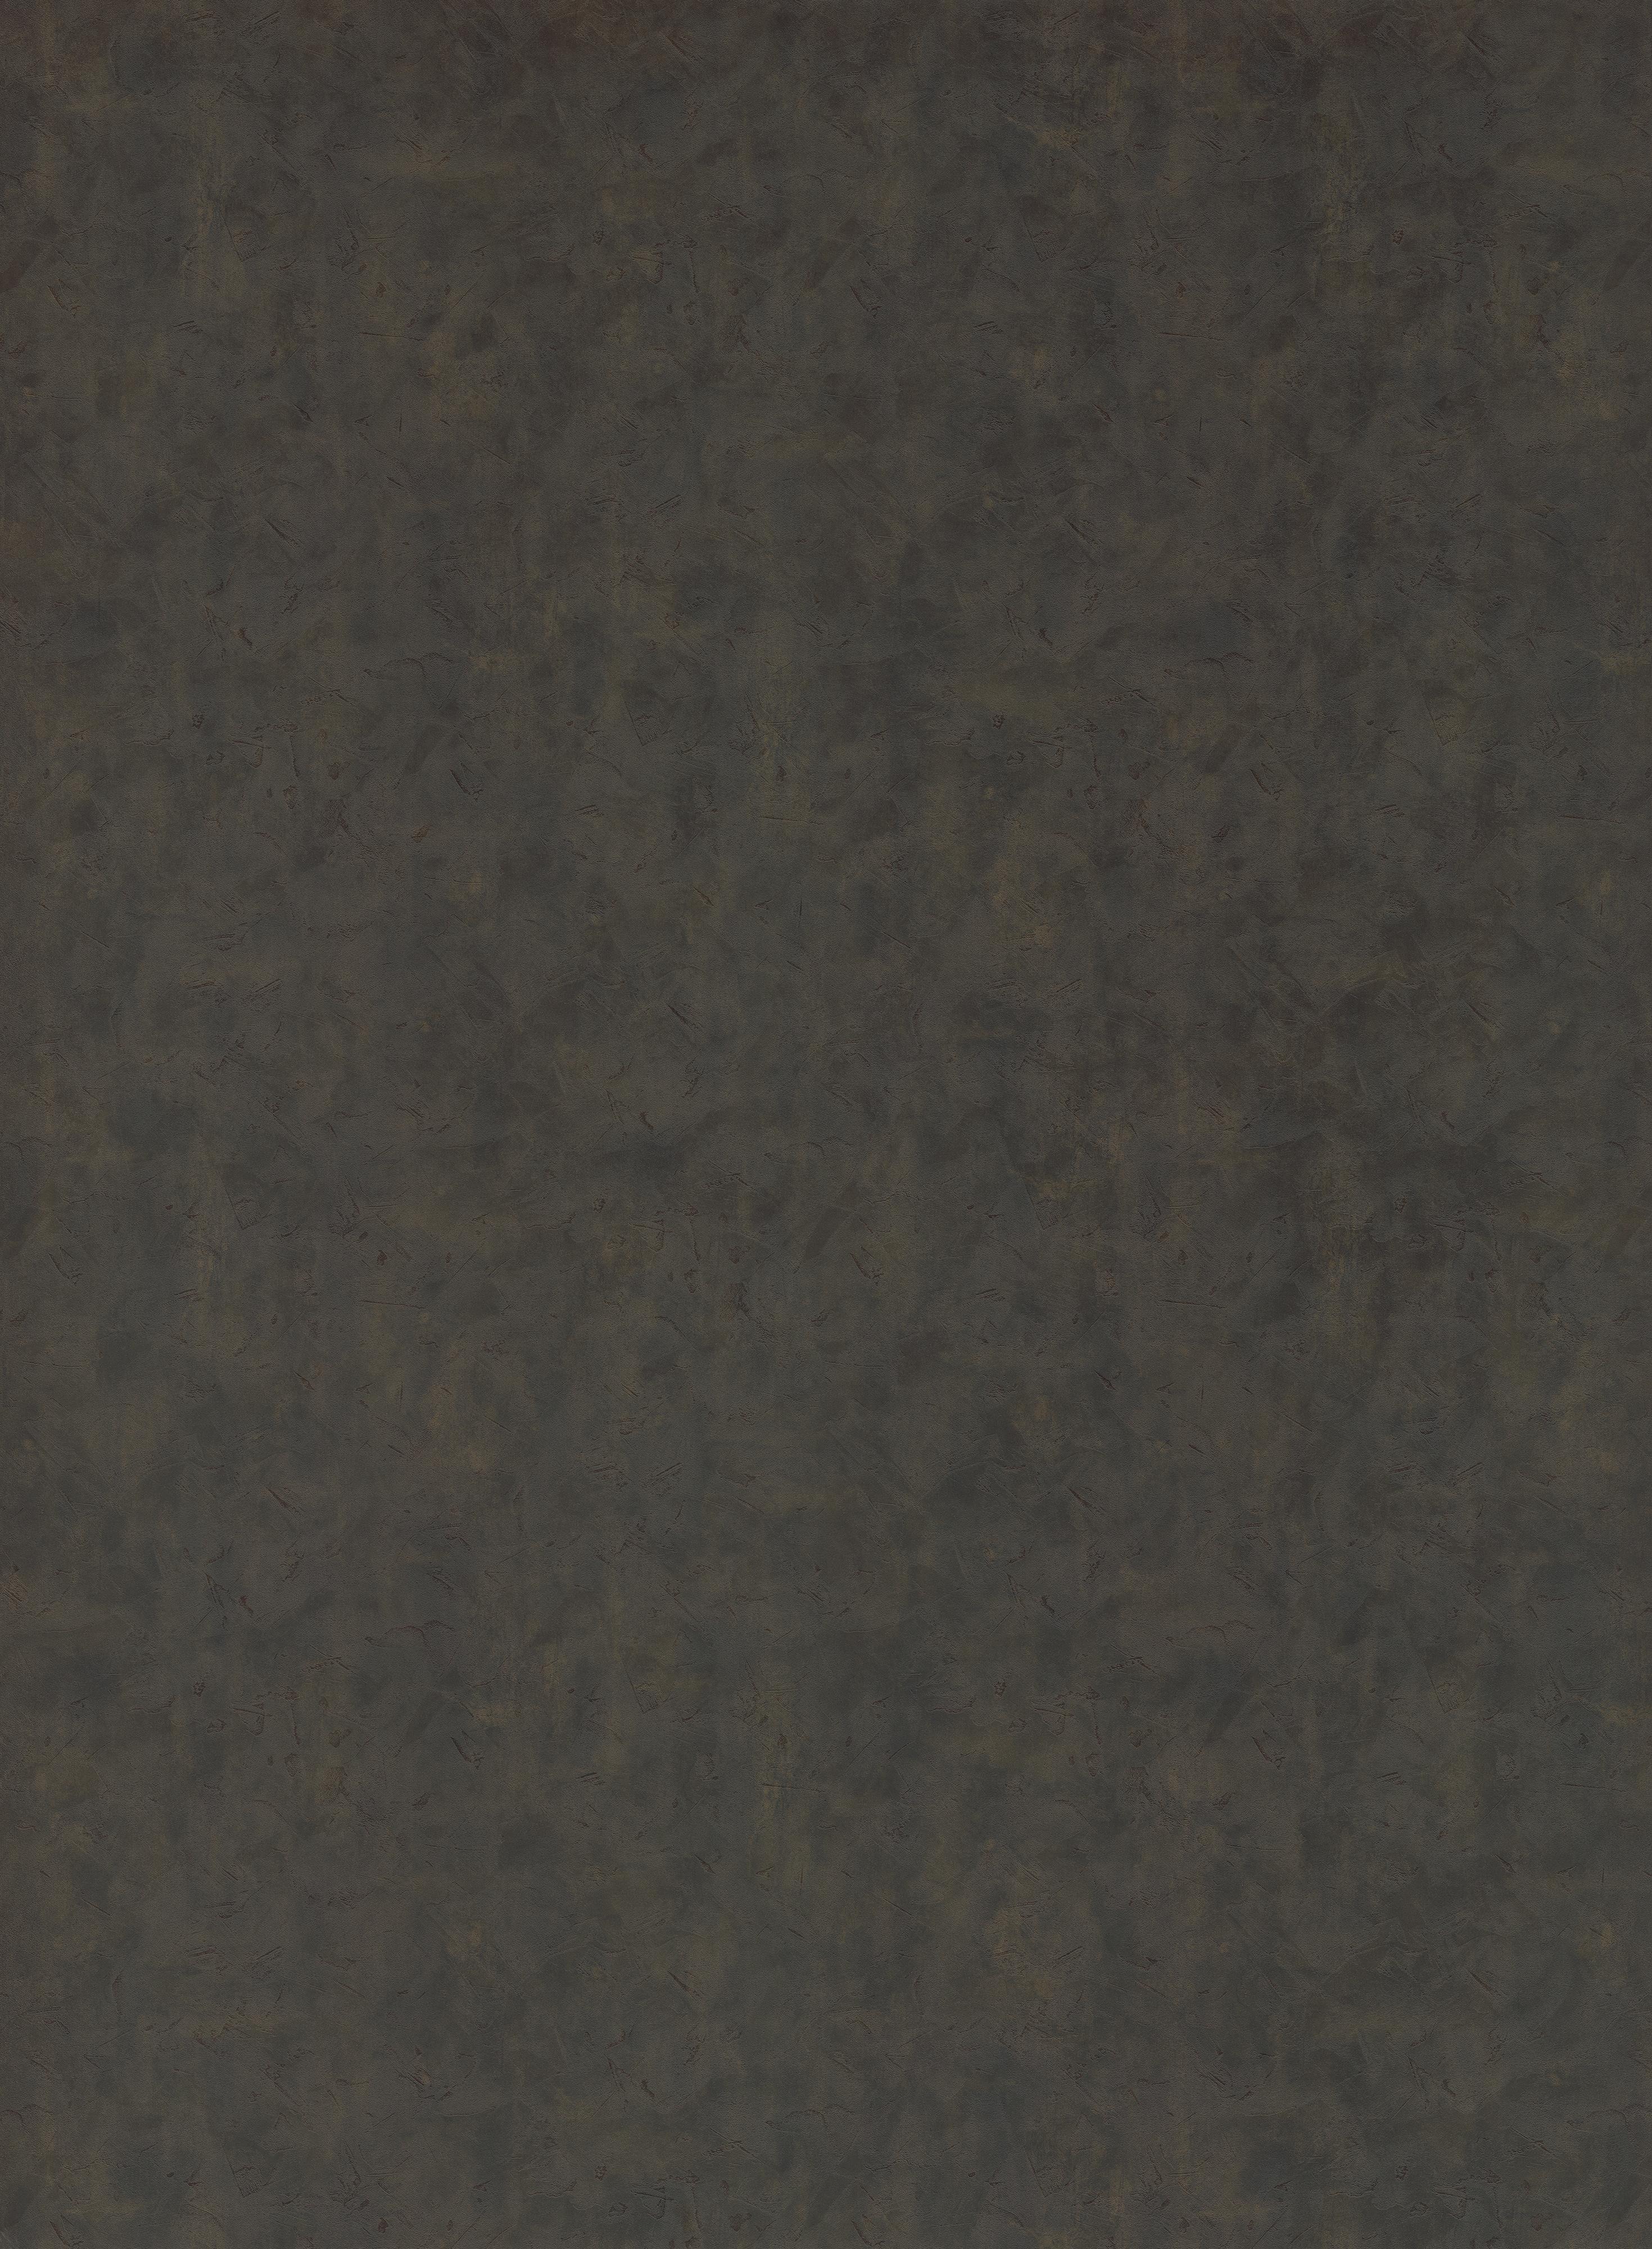 DecoLegno FB49 Ares, hele plaat afb. 2800x2070m/Tekenprogramma